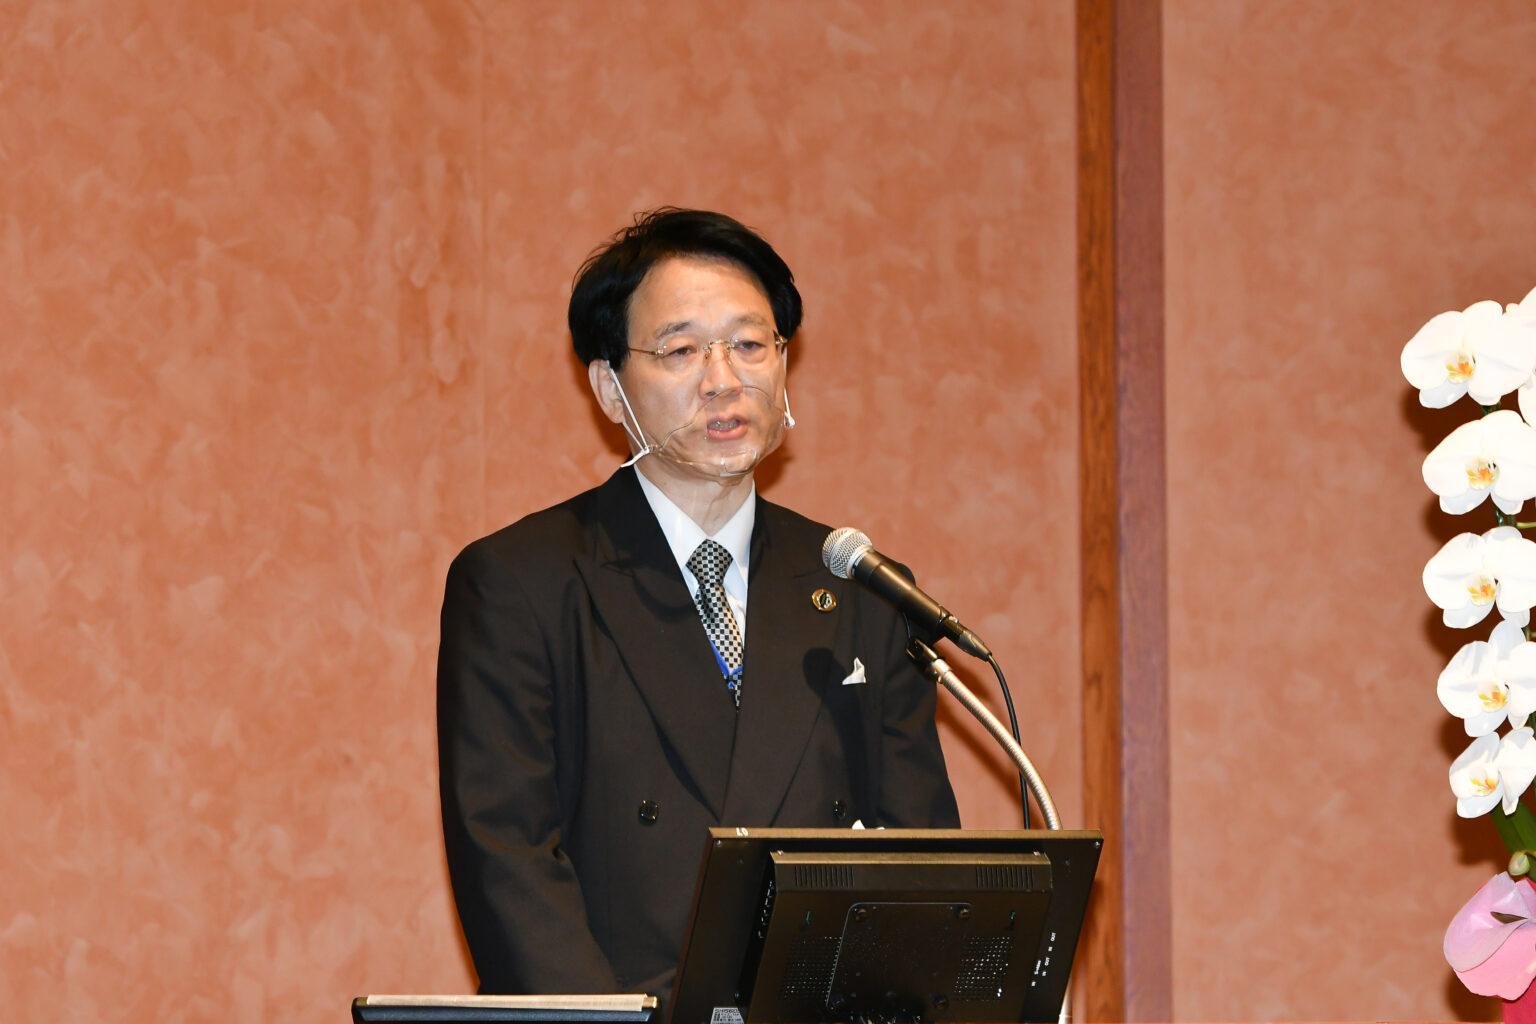 Opening Speech by Prof. Nagato Natsume